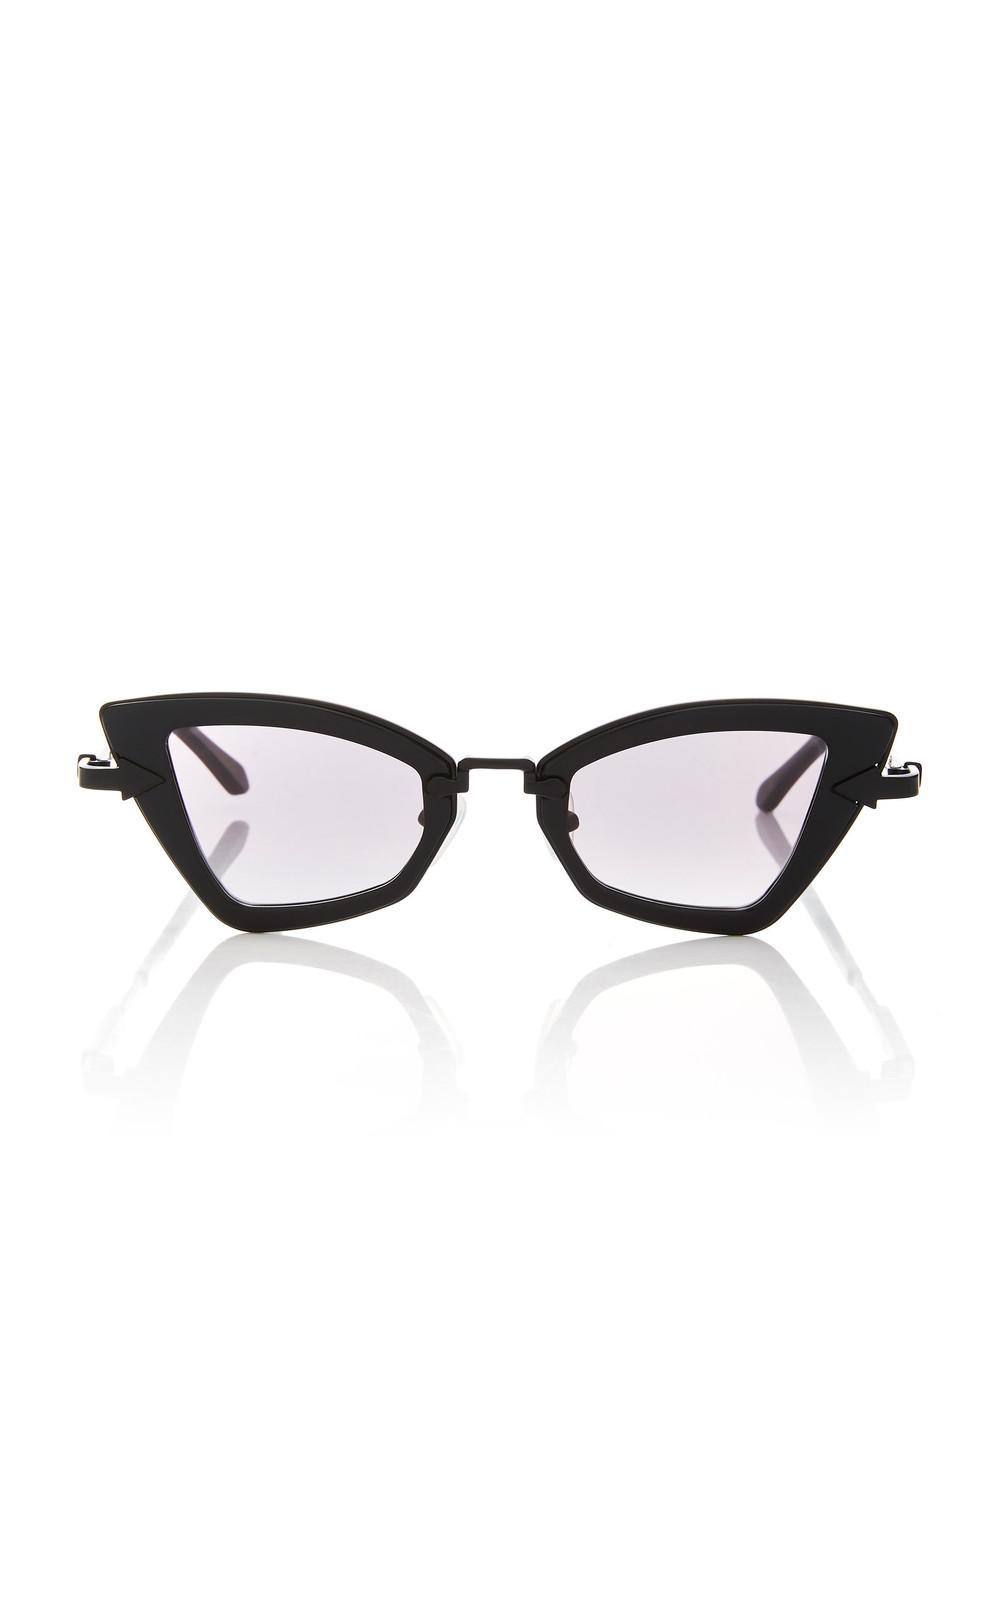 Karen Walker Bad Apple Square-Frame Acetate Sunglasses in black